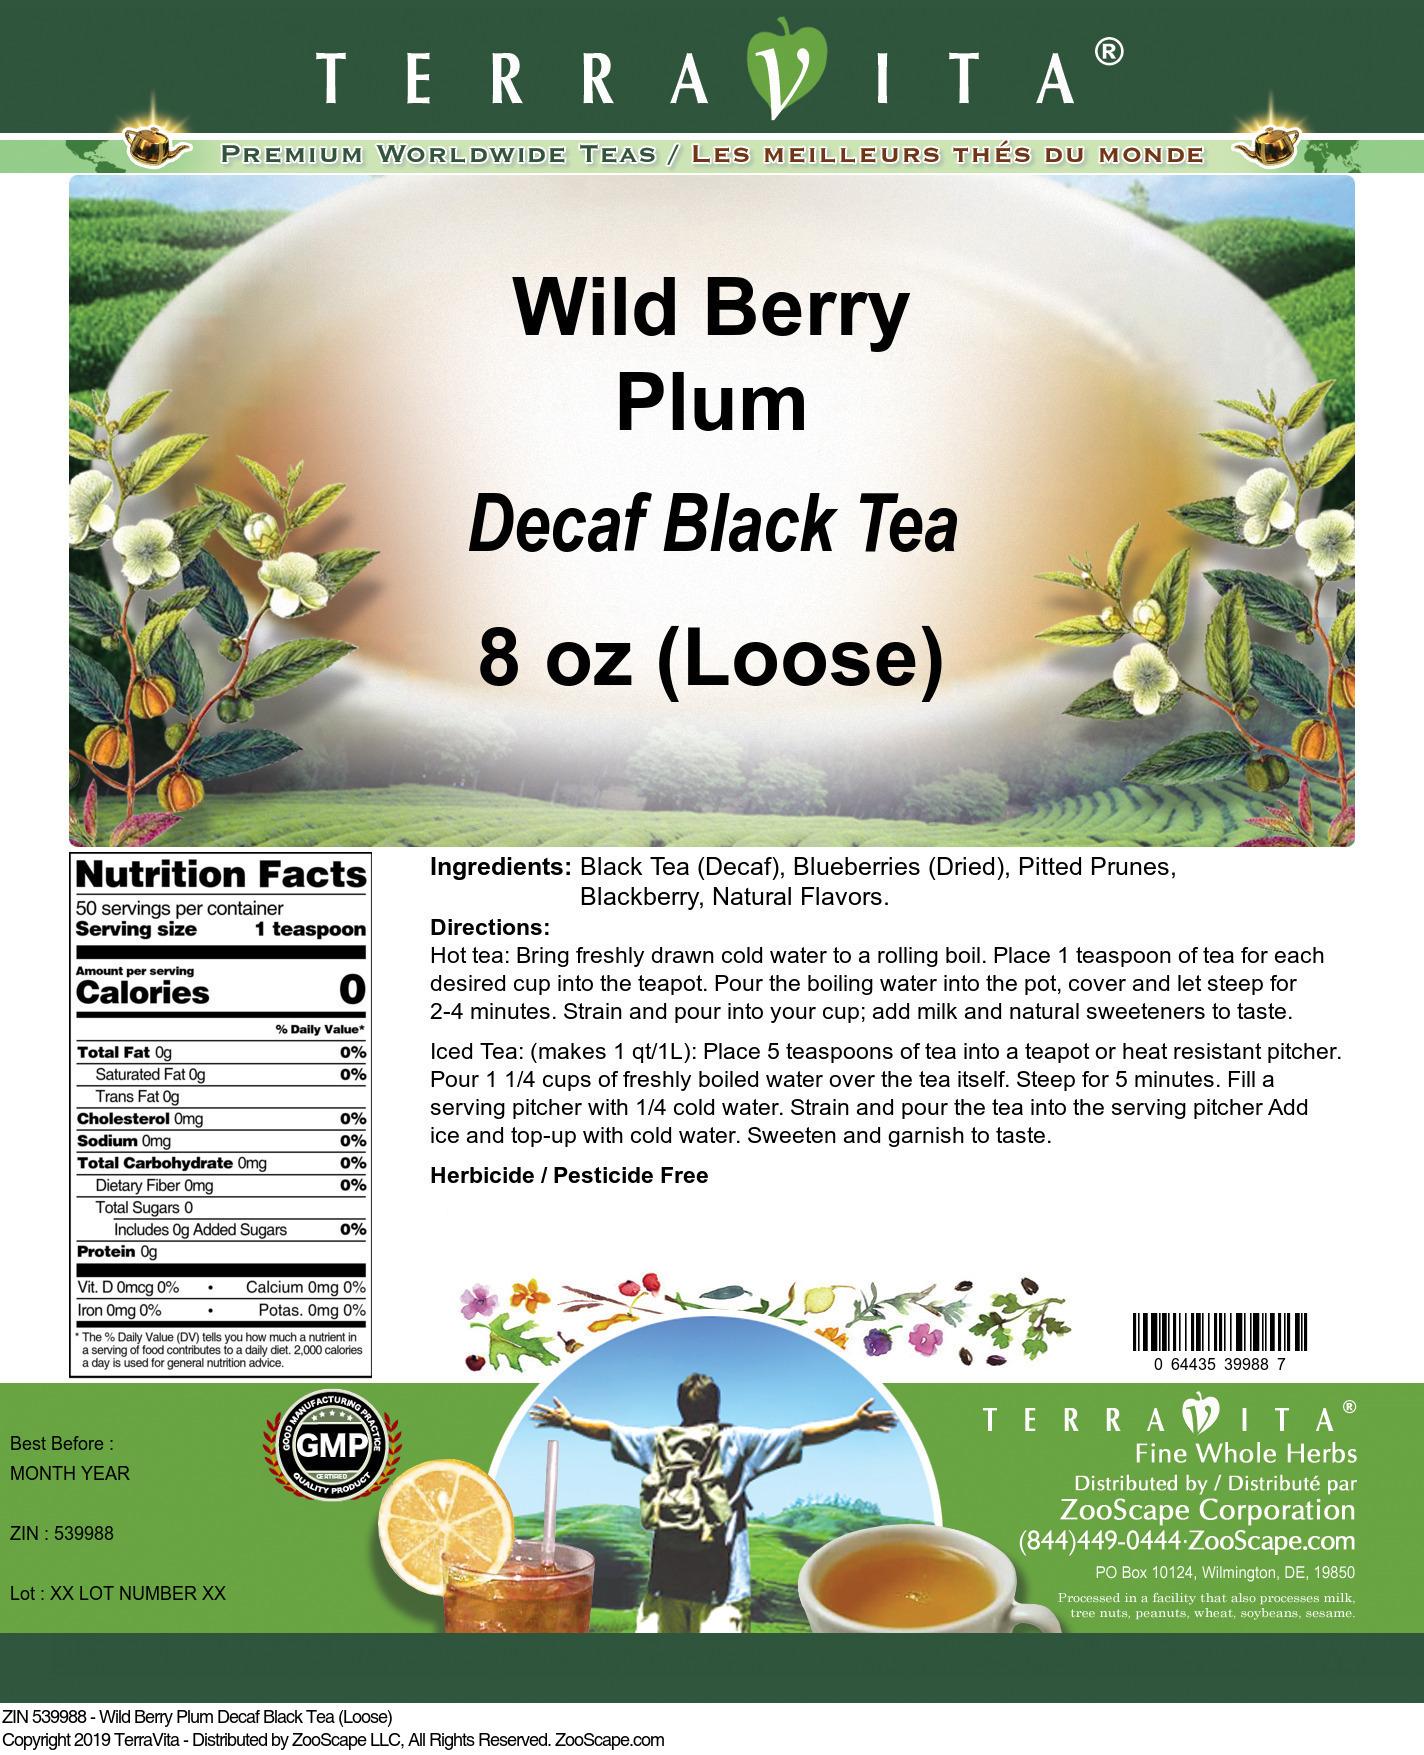 Wild Berry Plum Decaf Black Tea (Loose)